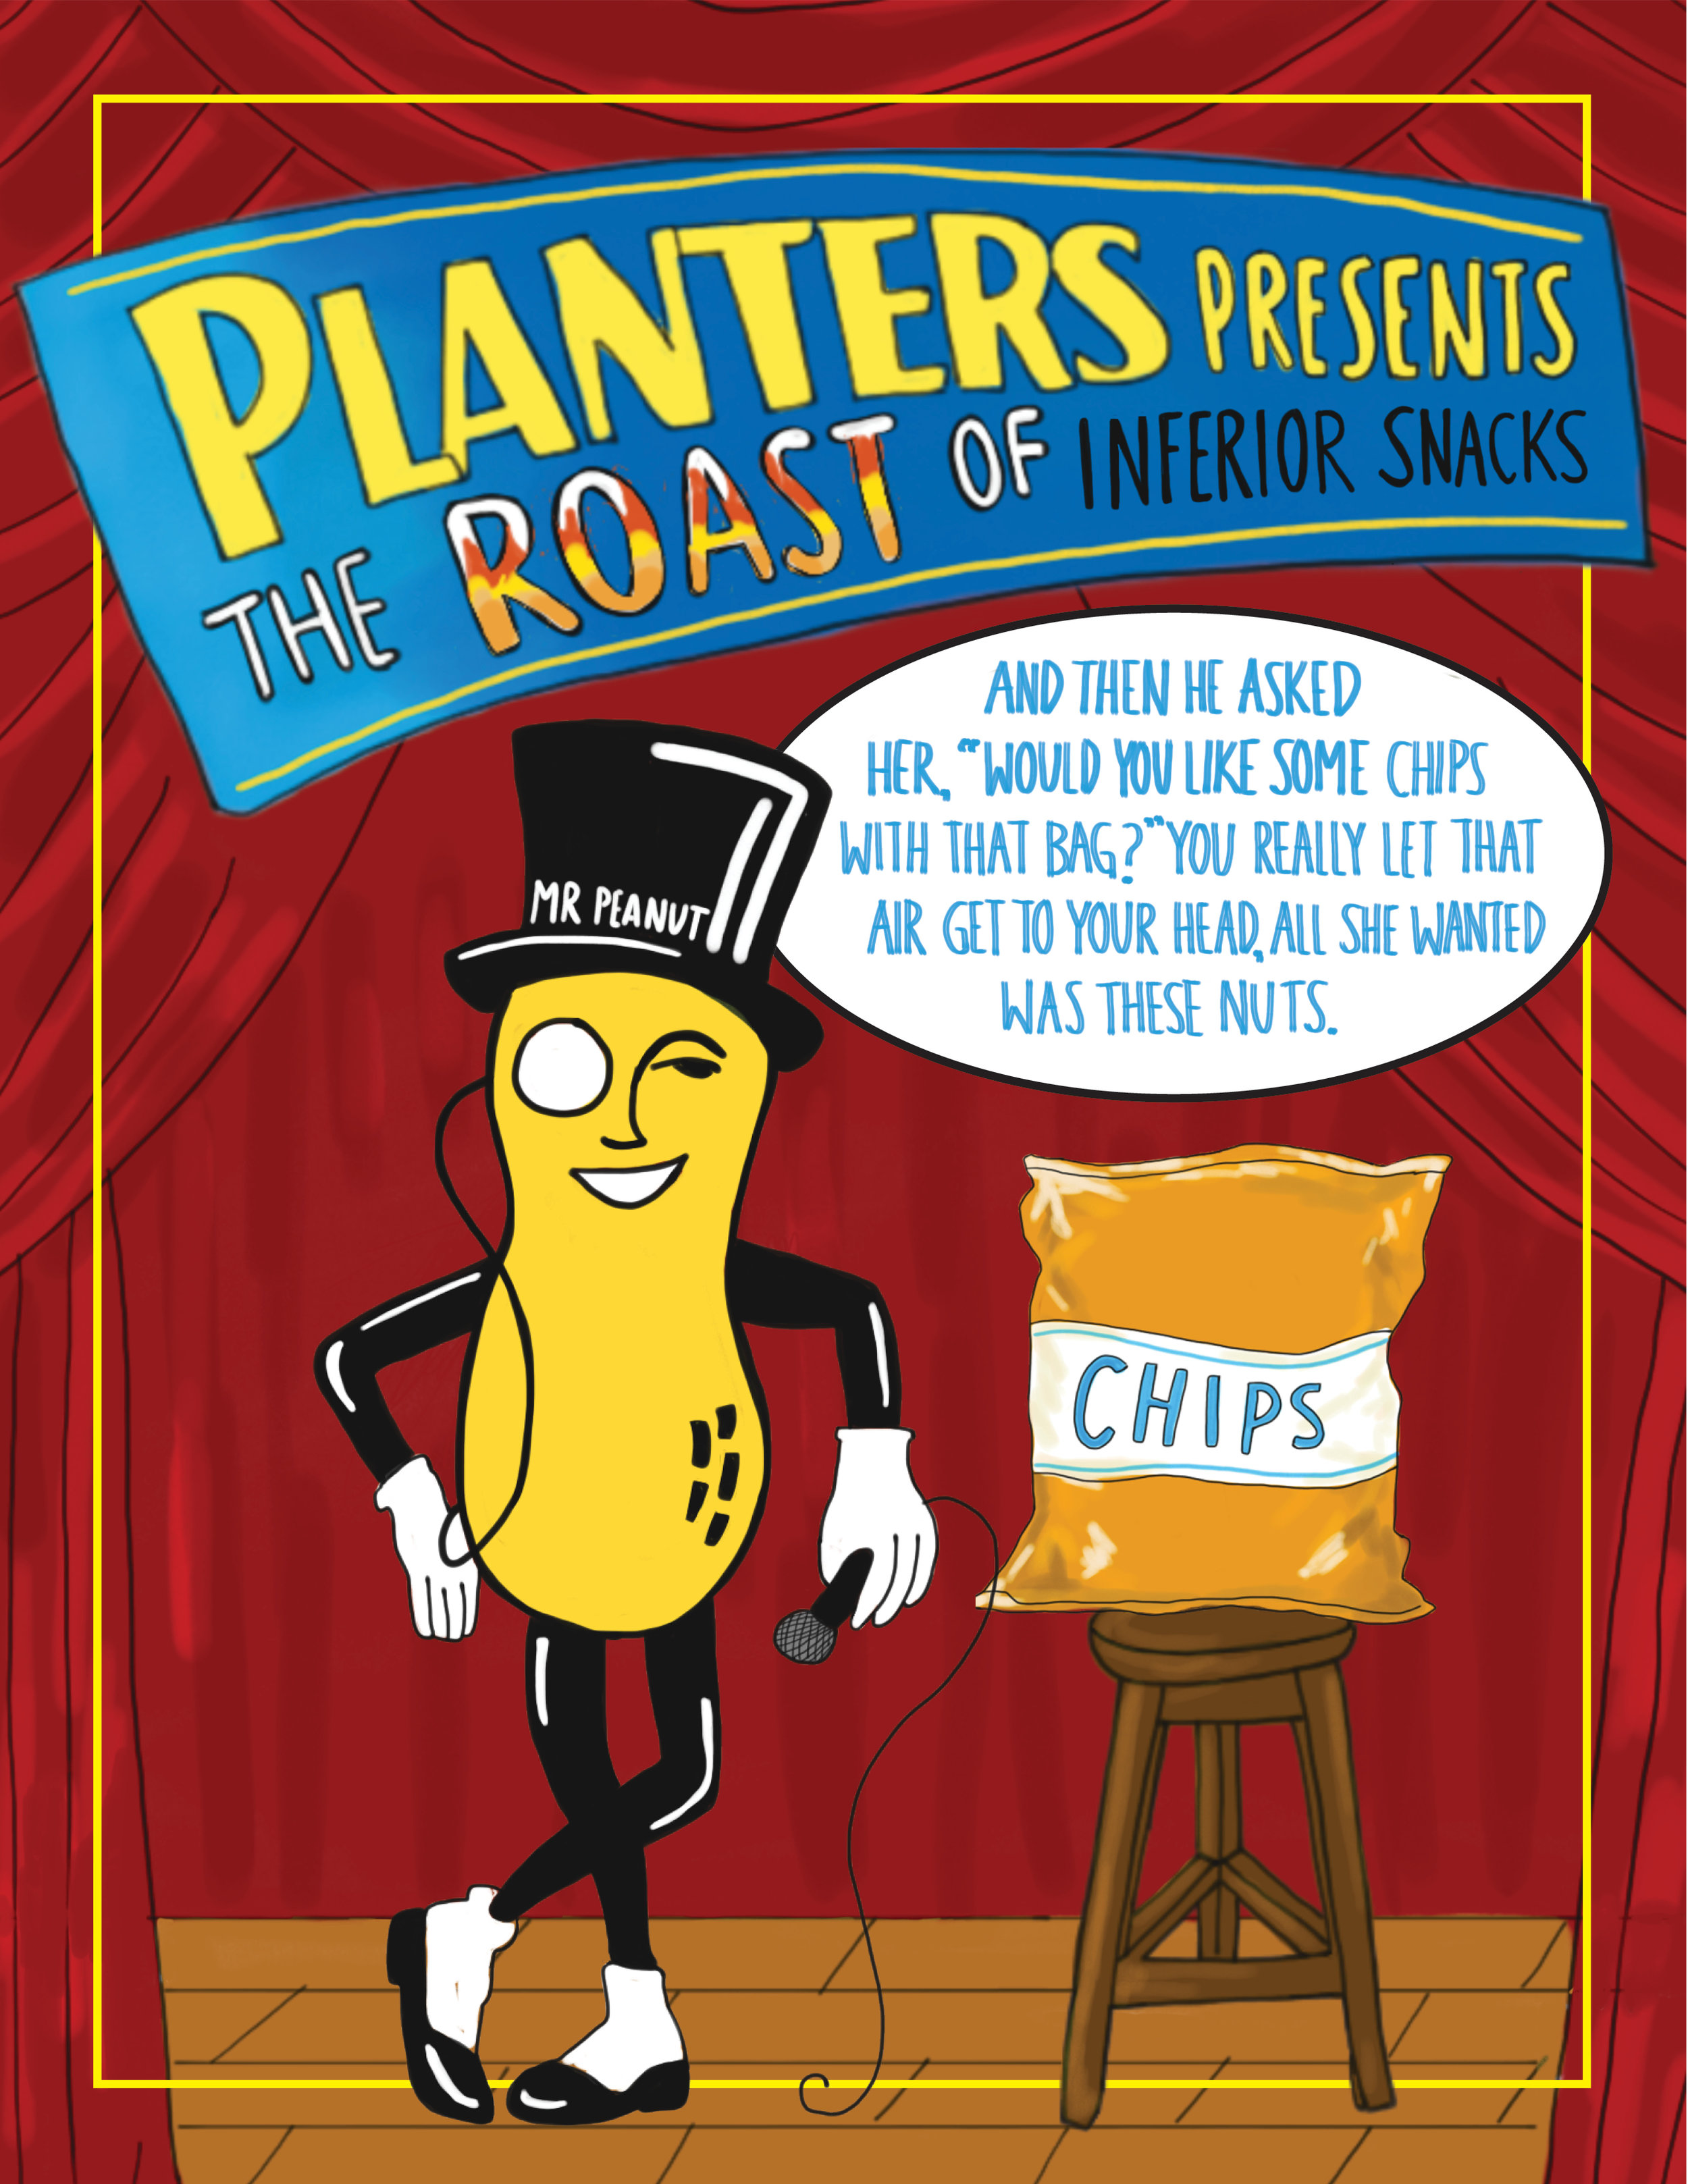 PlantersPeanuts3 copy.jpg